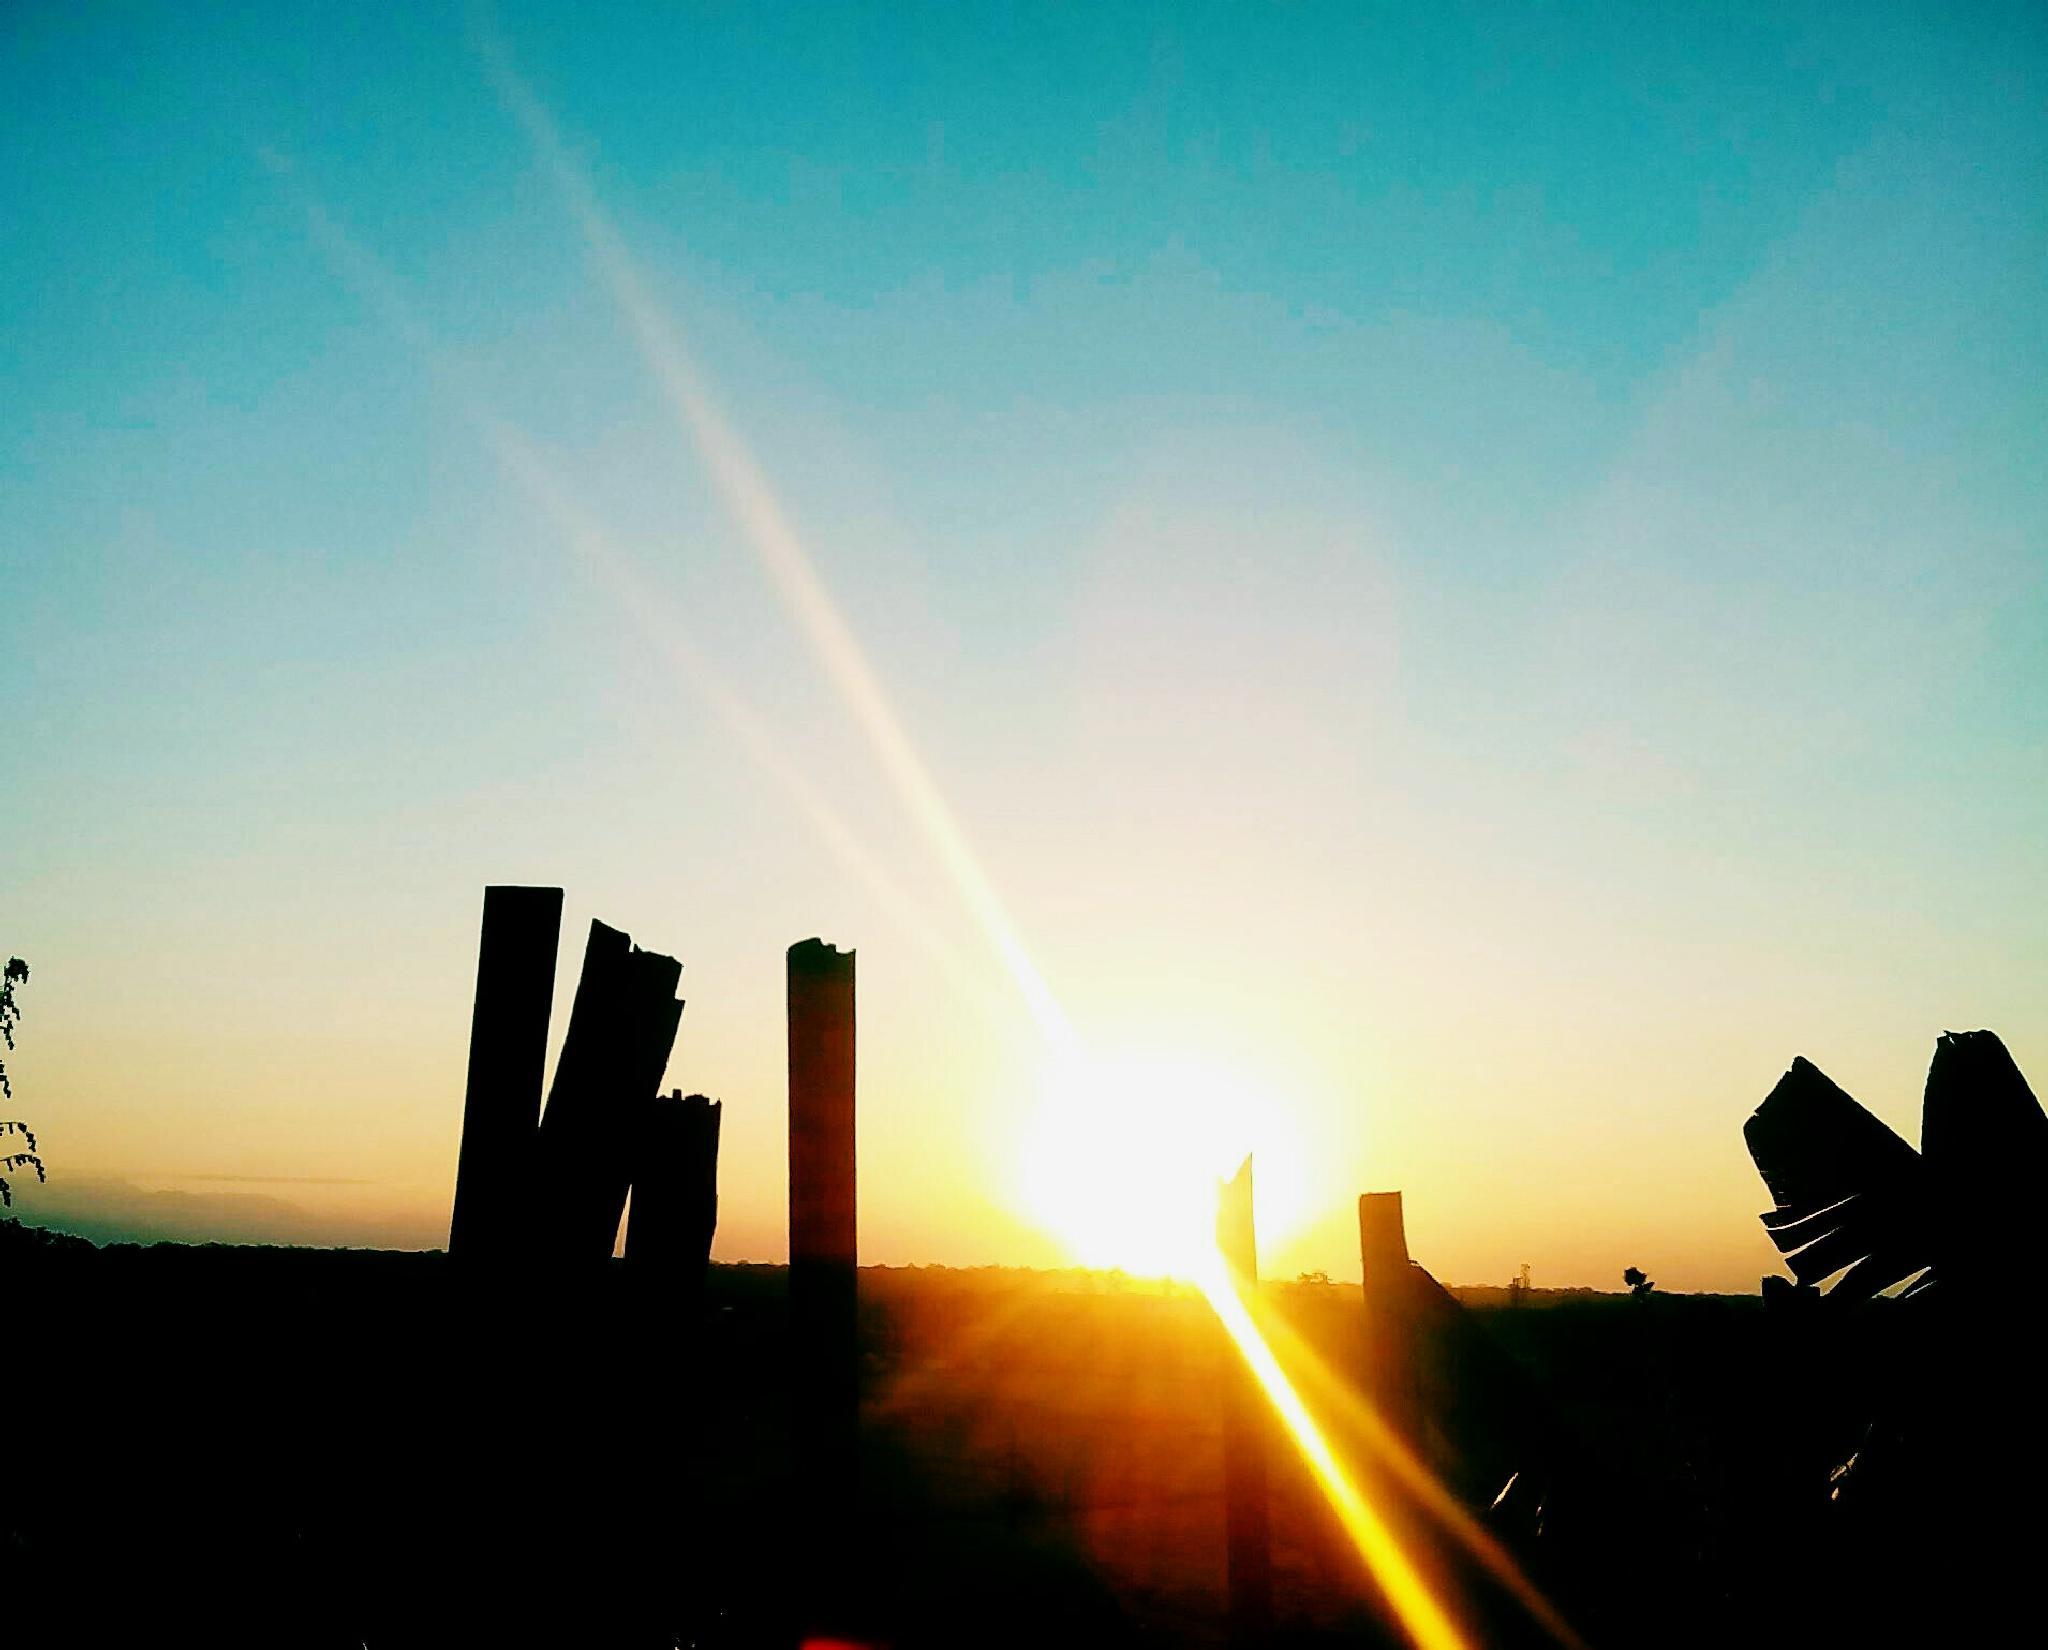 morning shot by jerry.lemme